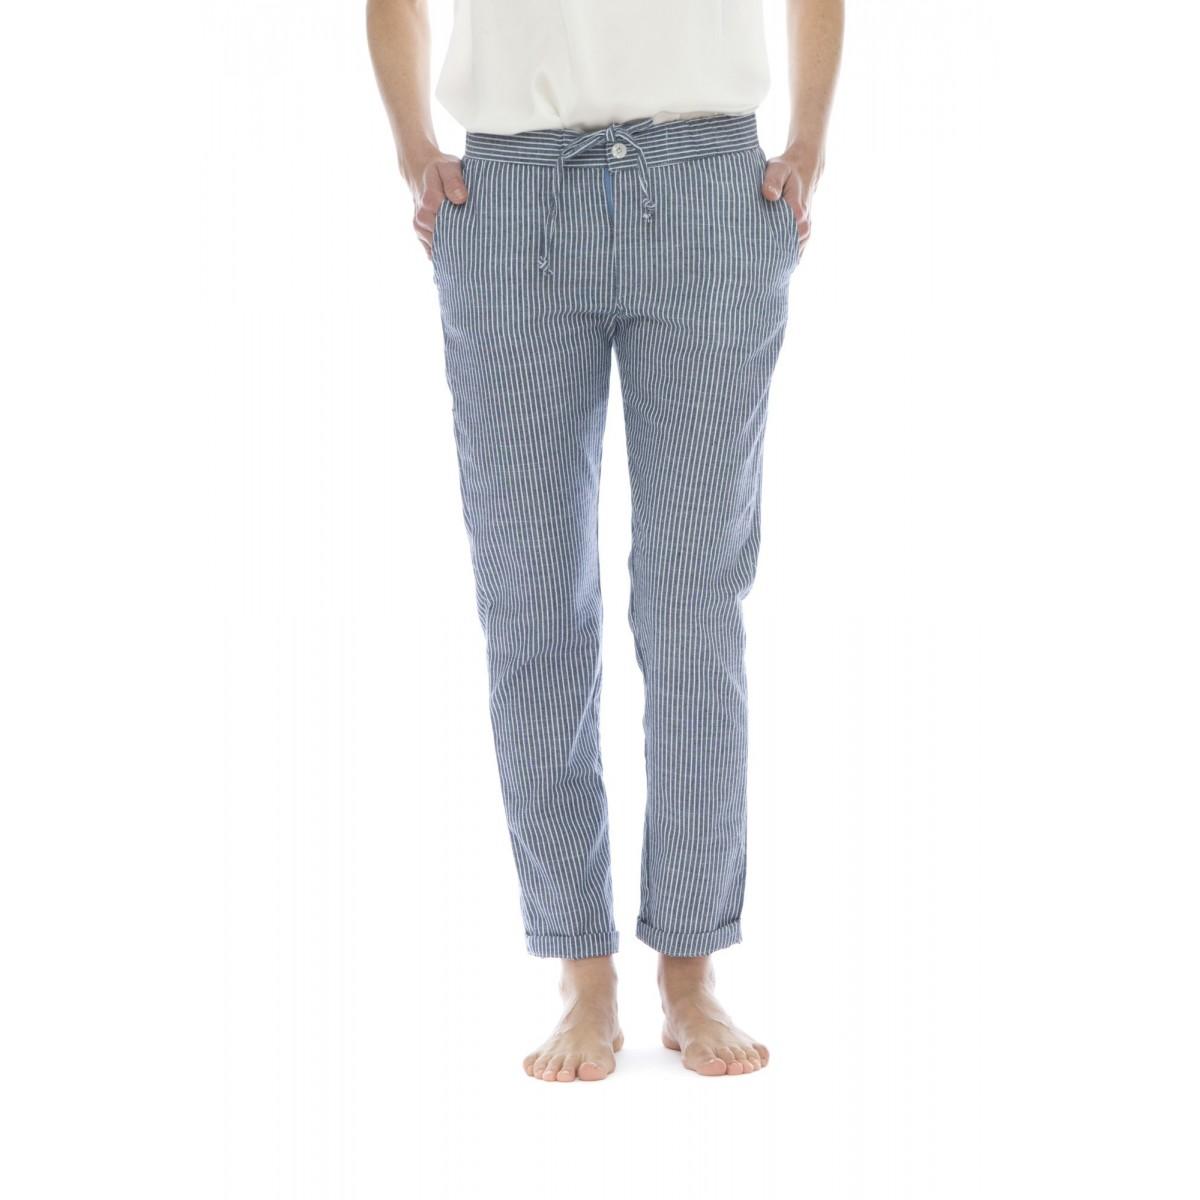 Pantalone donna - Abigail 26 pantalone jogging